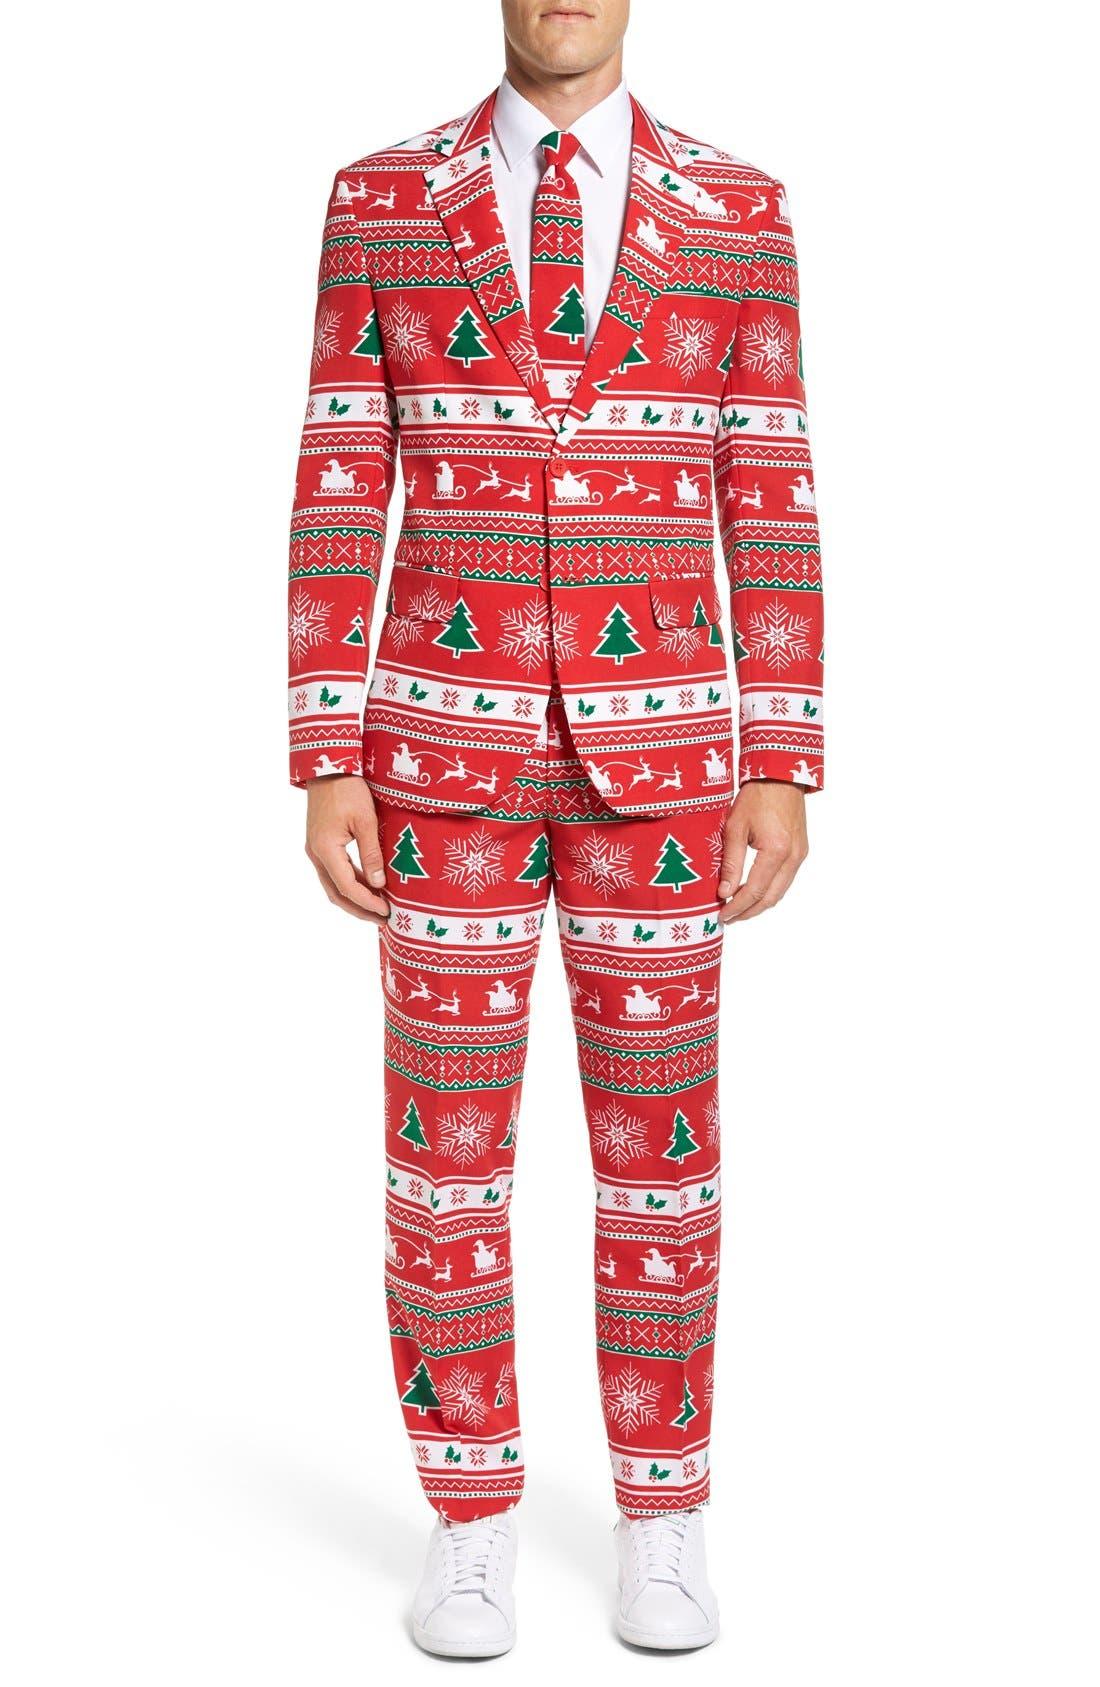 'Winter Wonderland' Trim Fit Two-Piece Suit with Tie,                         Main,                         color, Dark Red